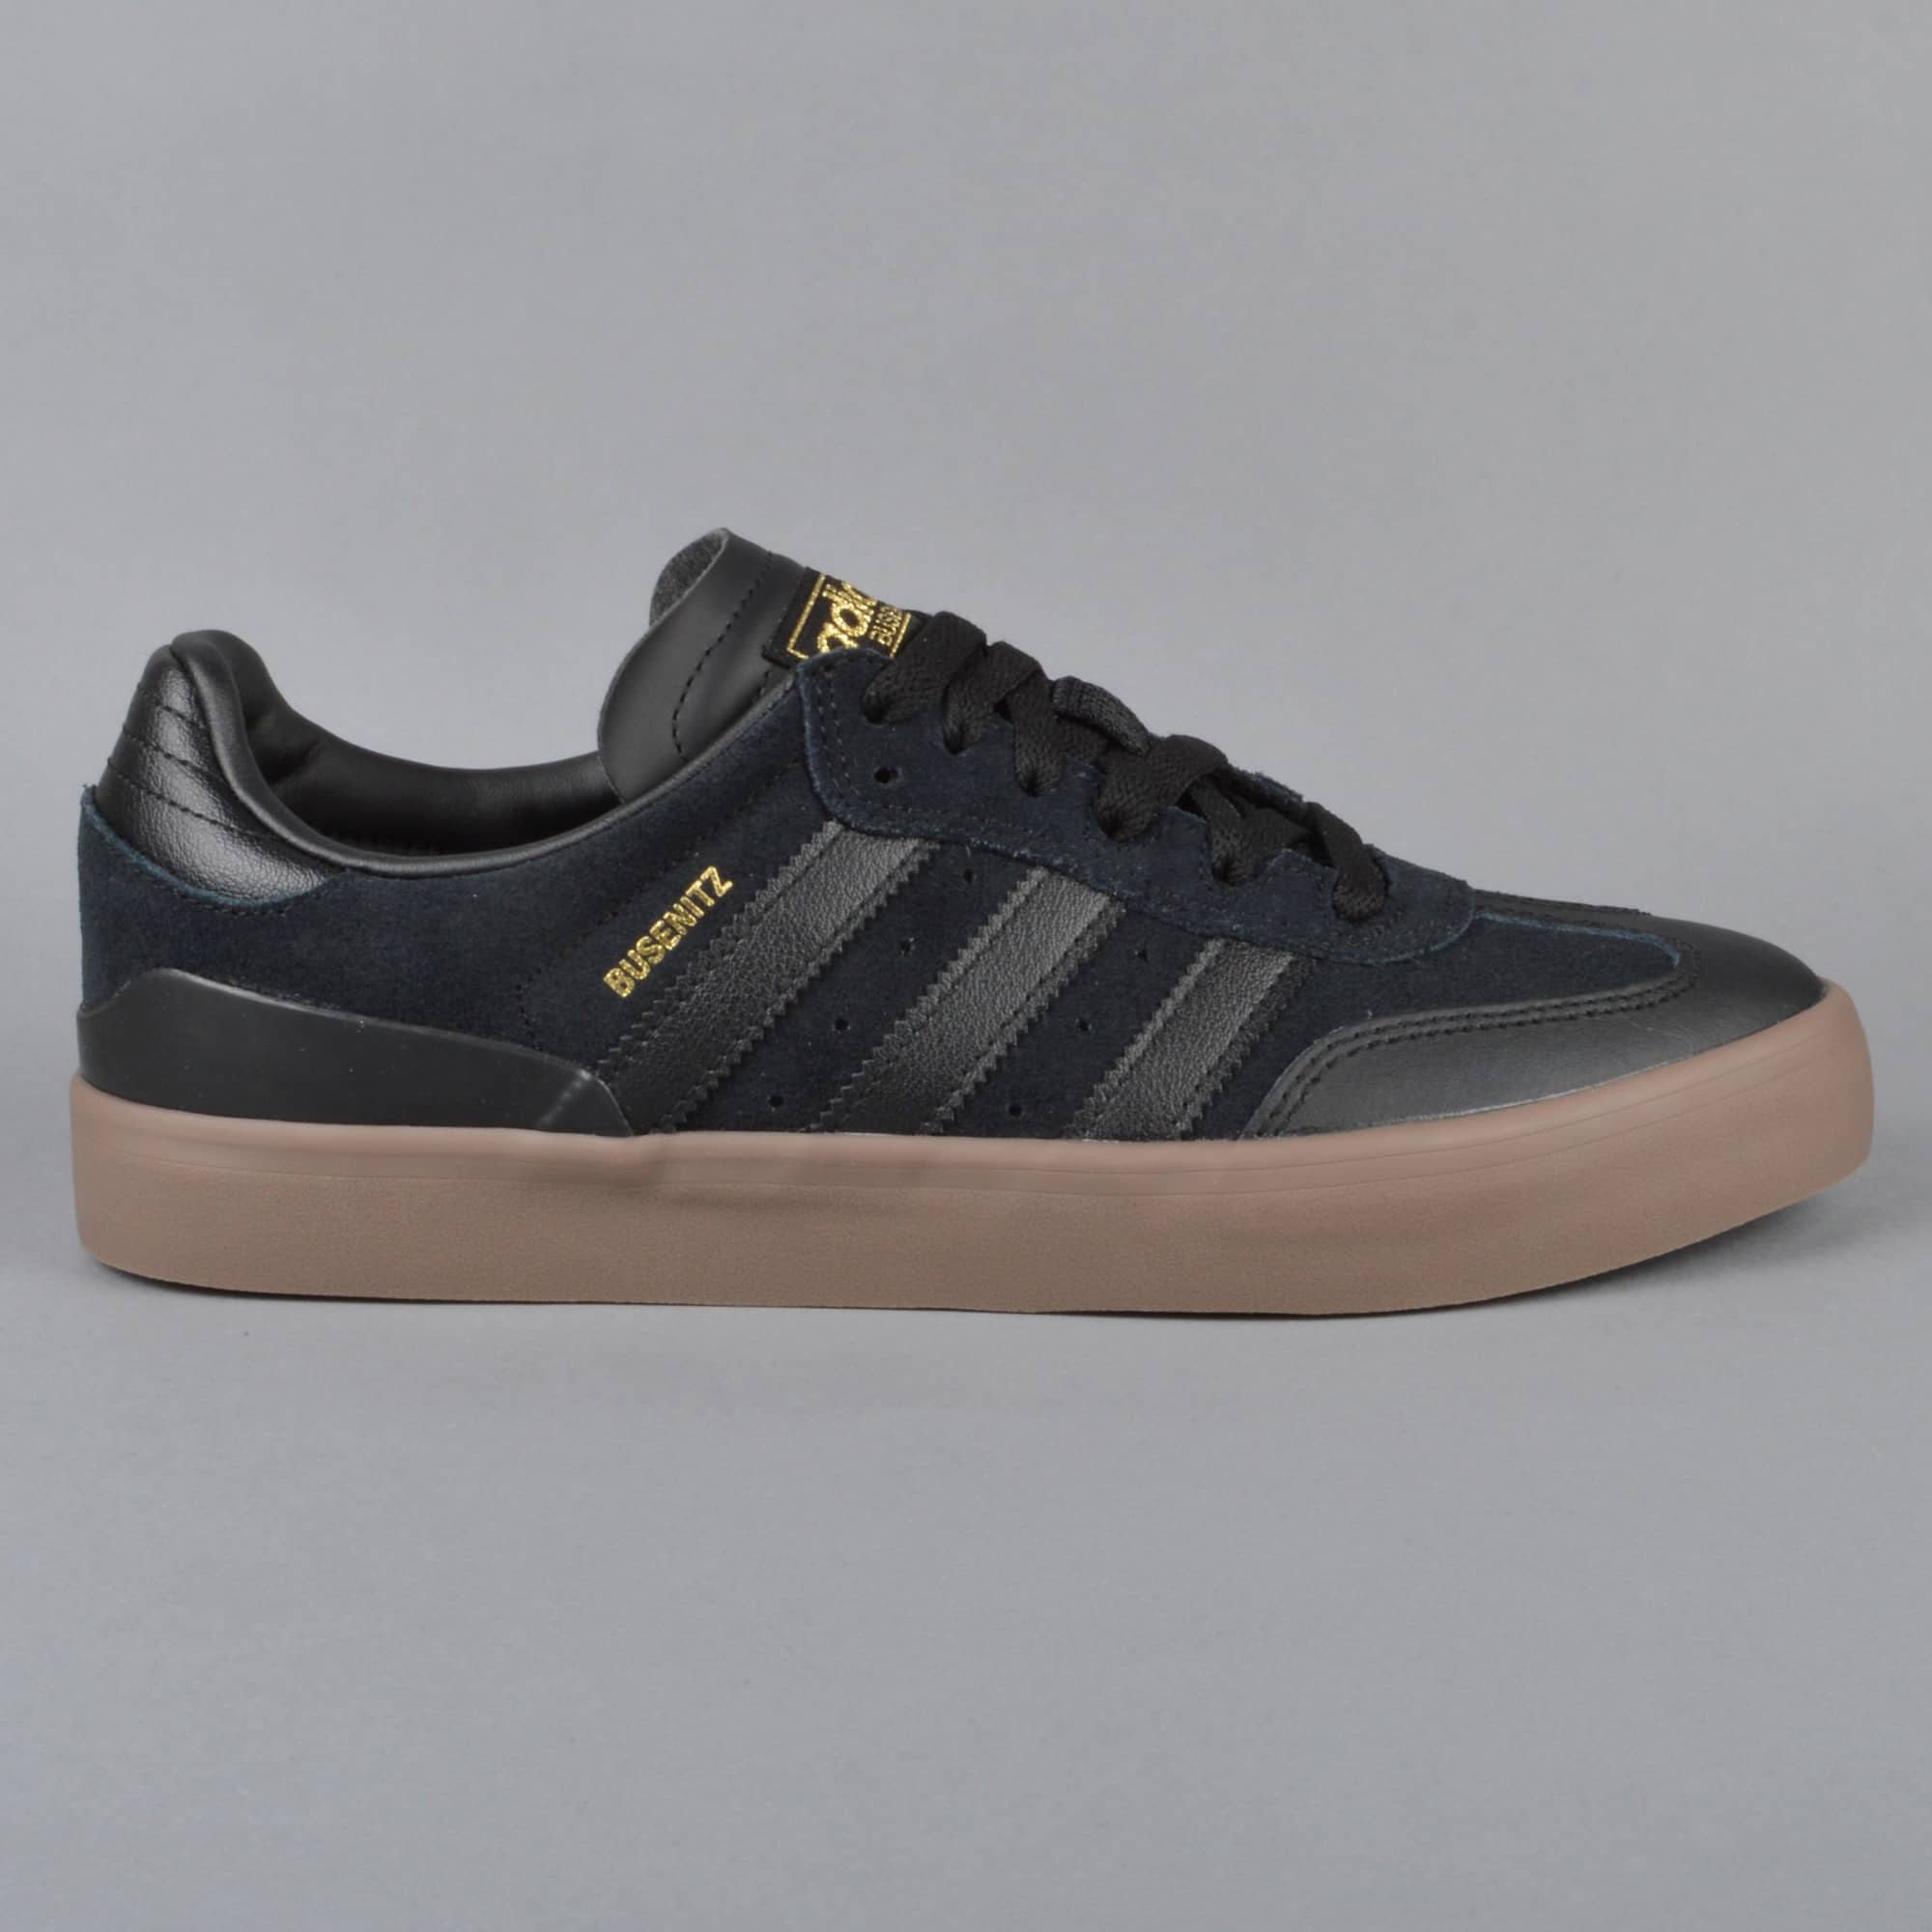 adidas busenitz vulc rx skate shoes off 71% - www.usushimd.com